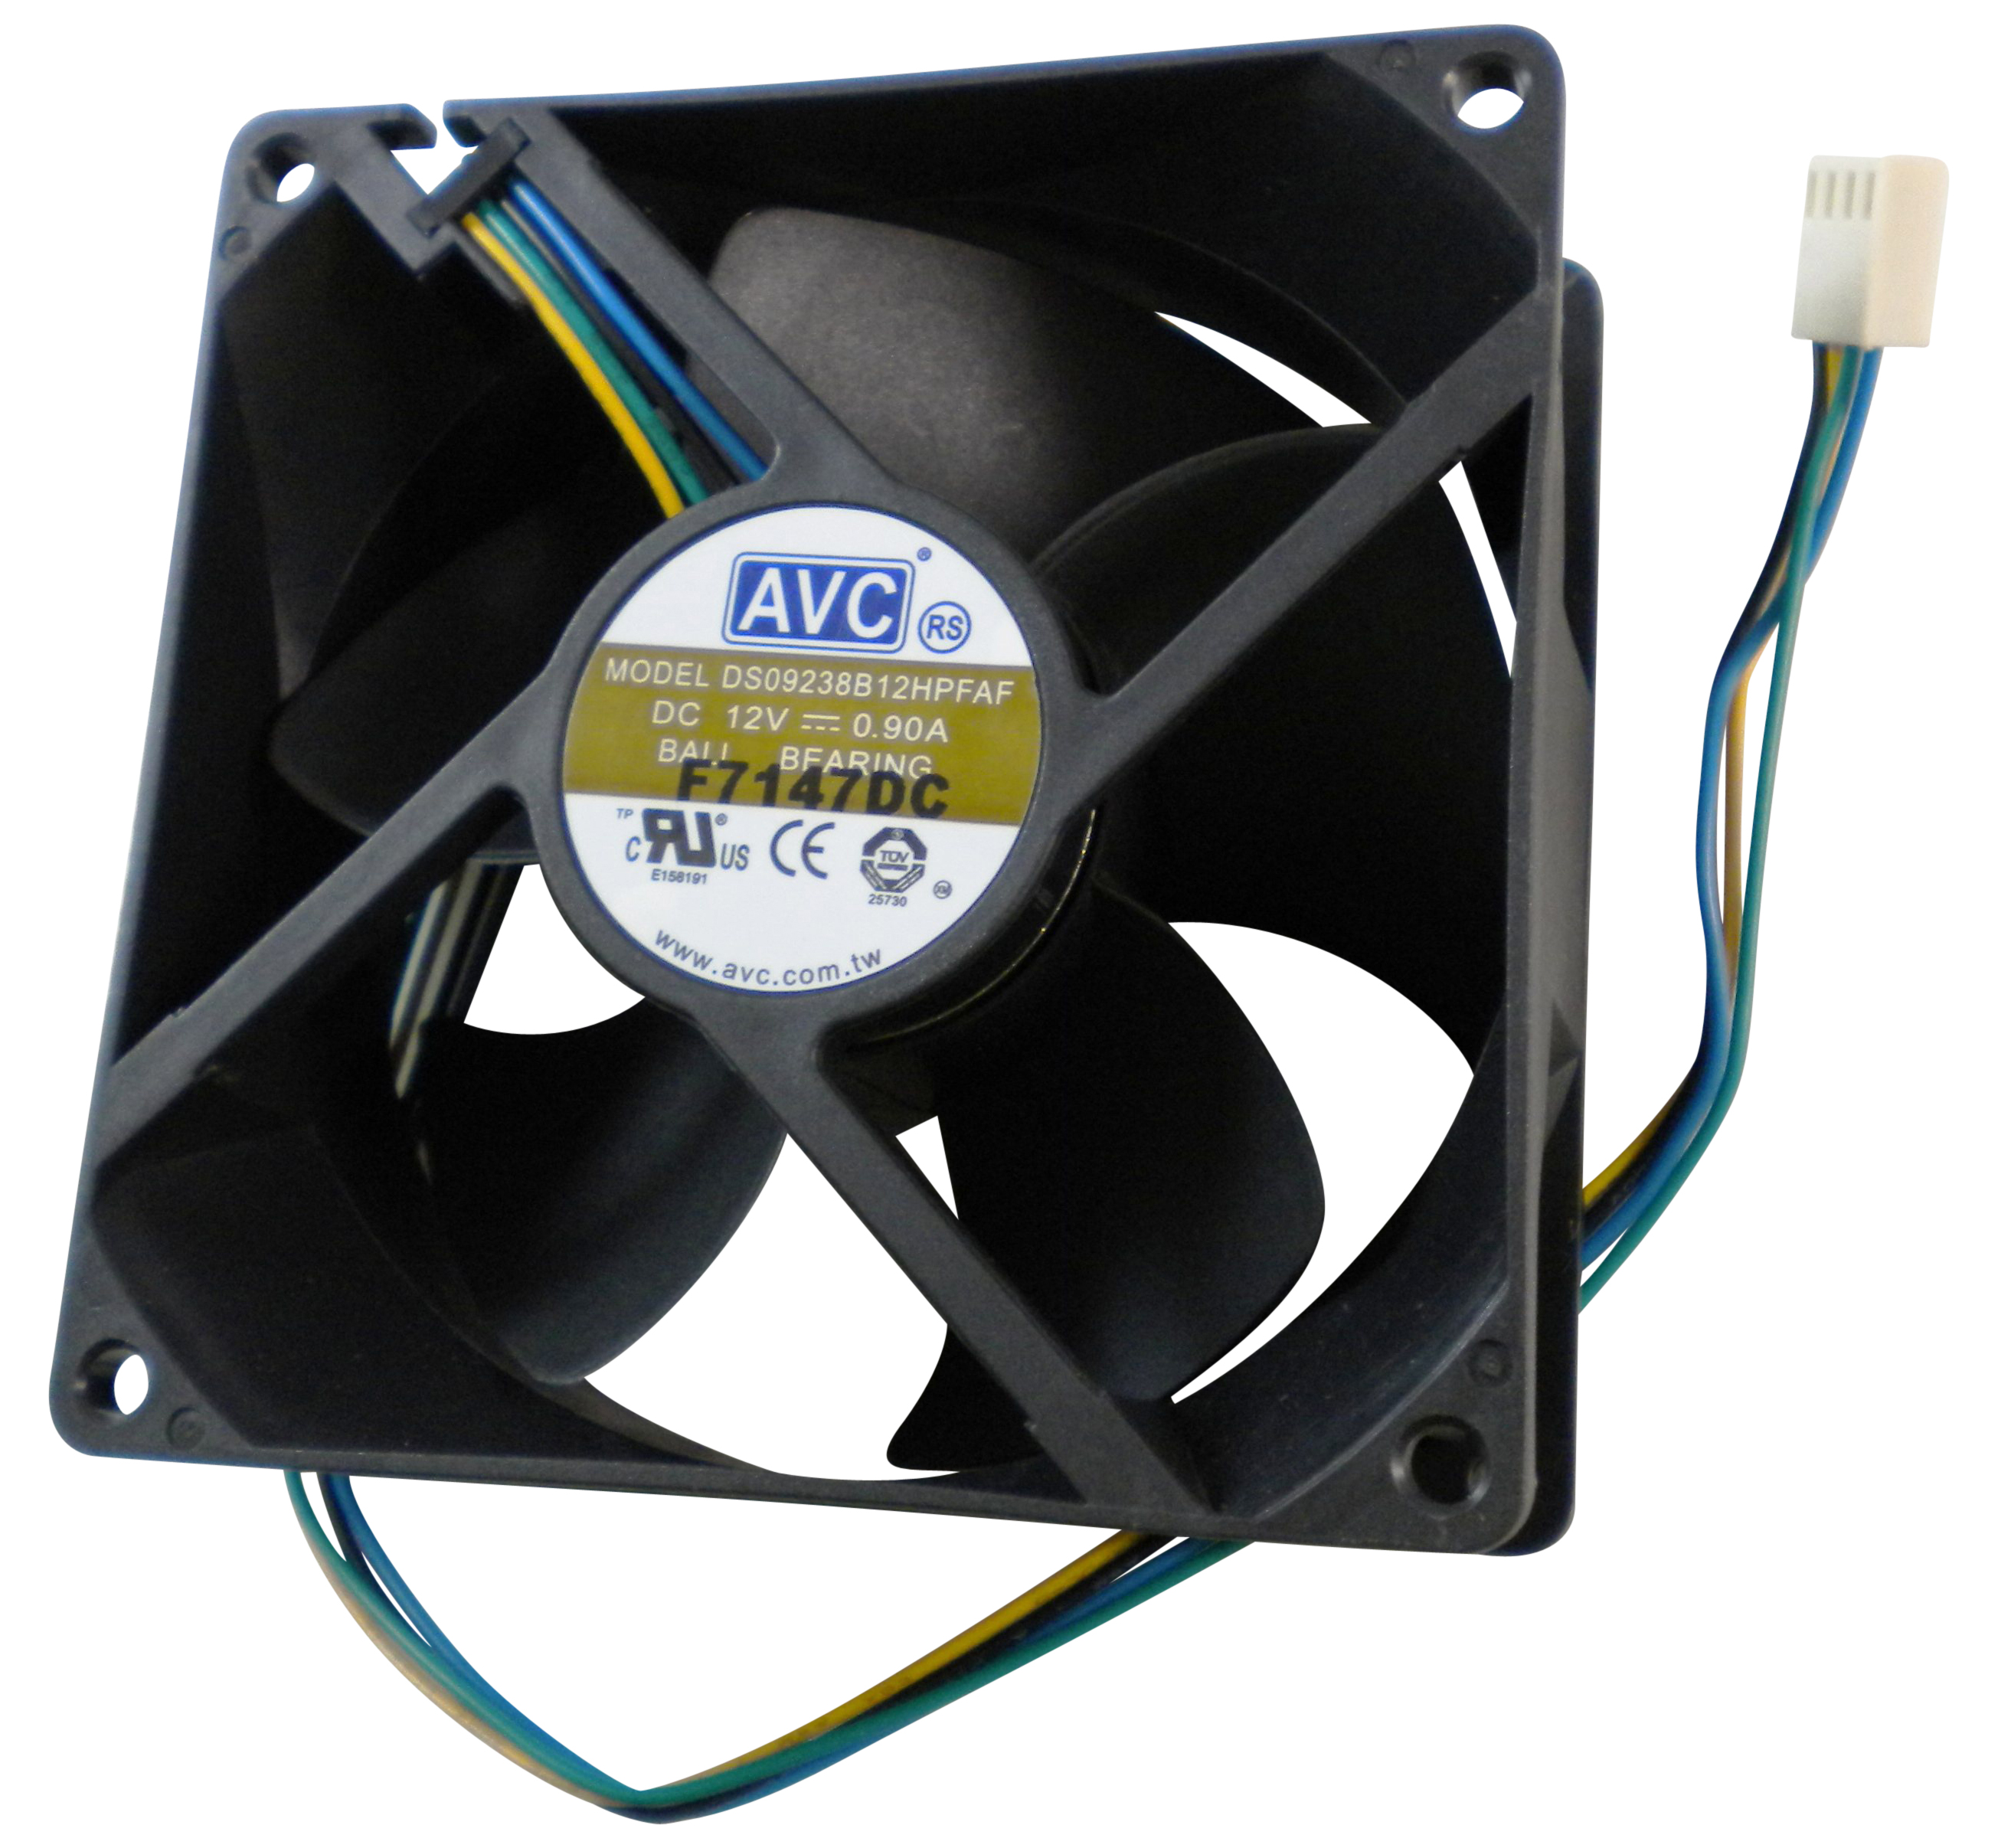 AVC DS09238B12HP020 92mm X 38mm 4-Pin PWM 2BB high speed fan